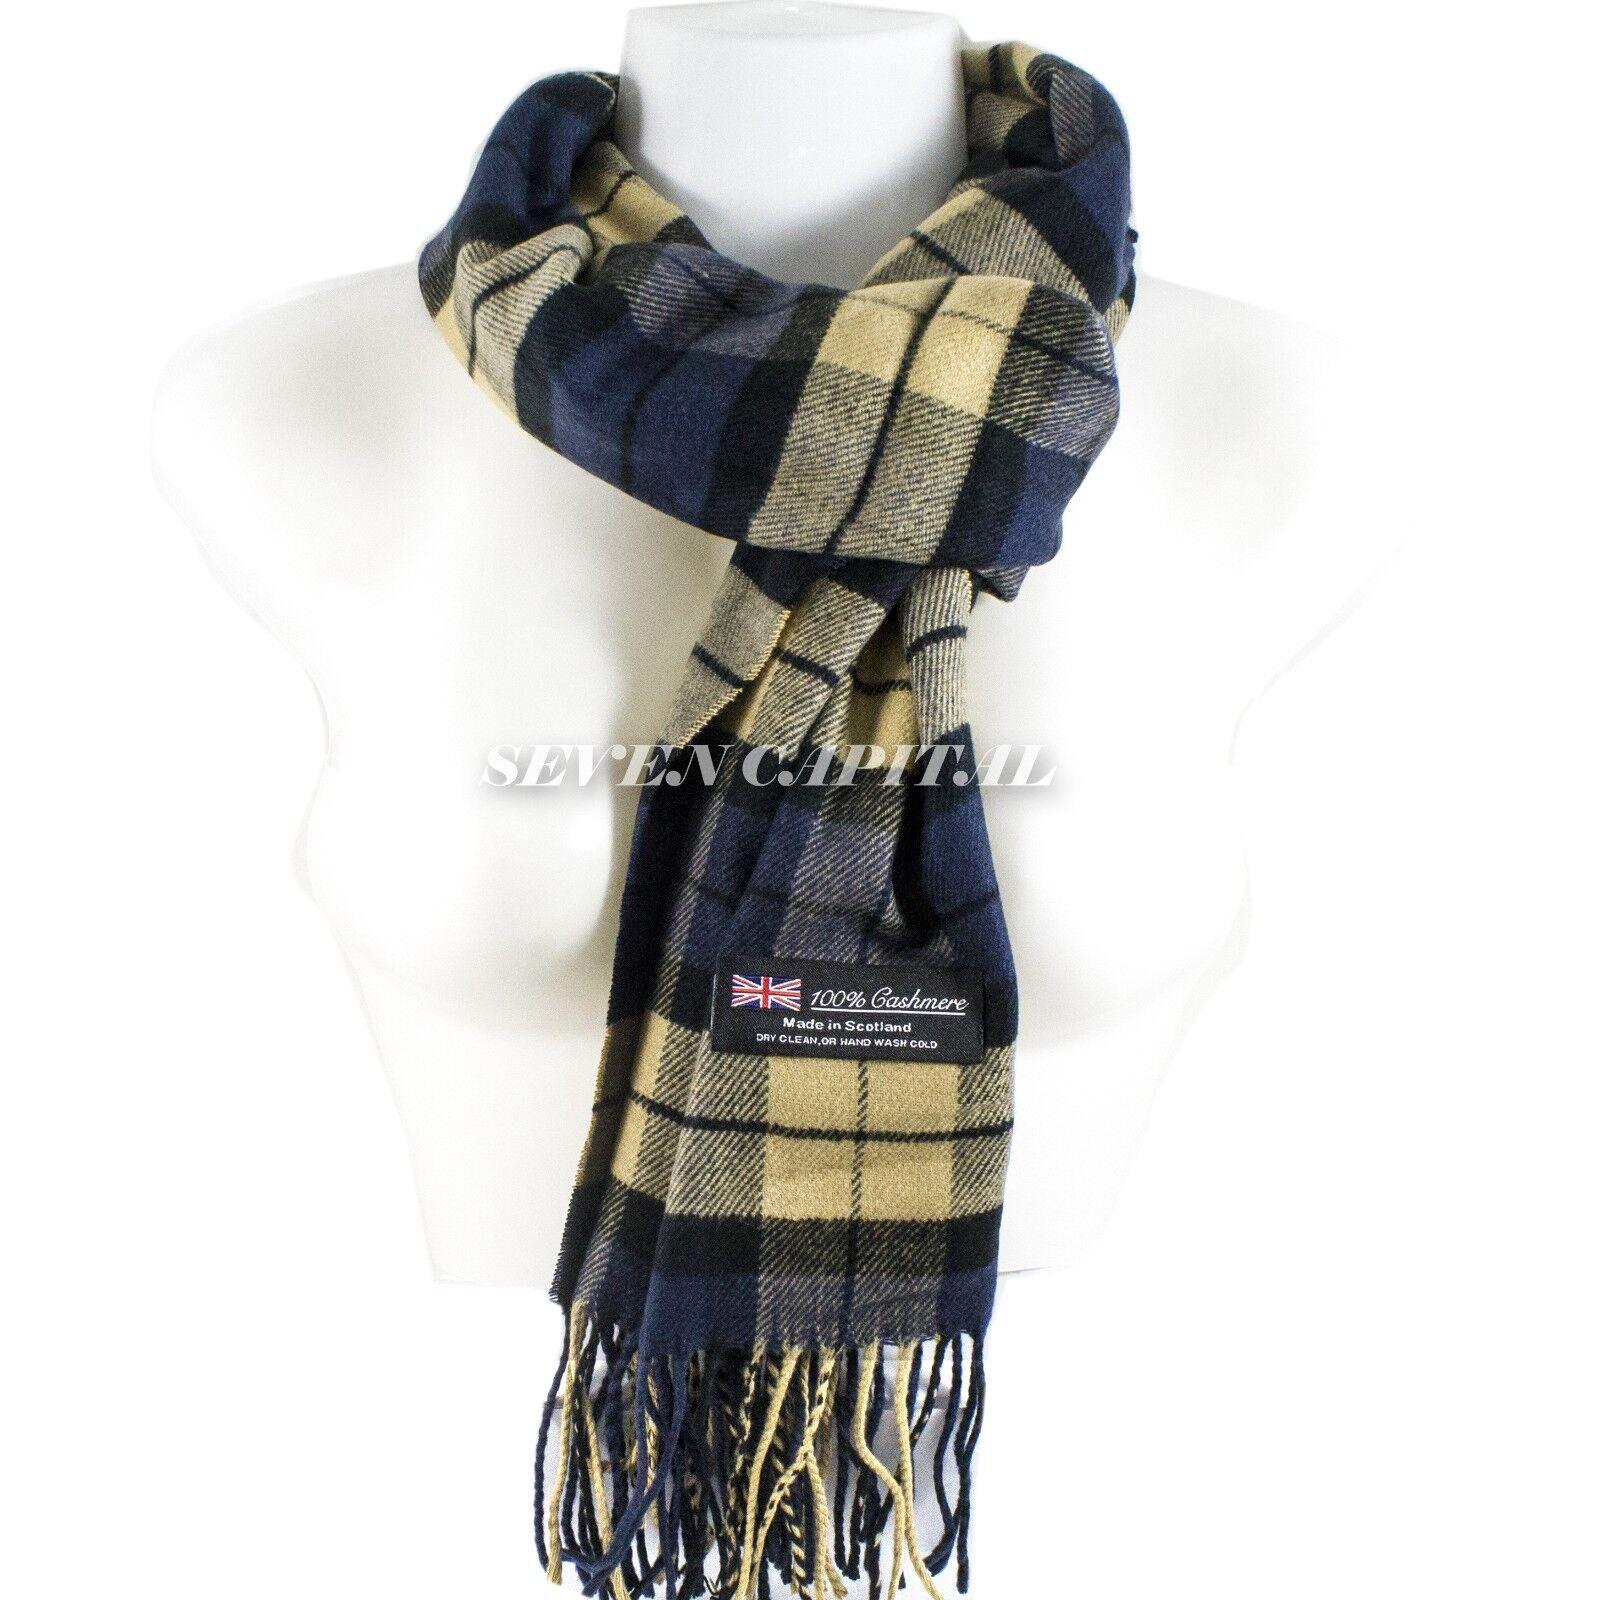 Mens Womens Winter Warm SCOTLAND Made 100% CASHMERE Scarf Scarves Plaid Wool 1. Plaid: Navy/Beige